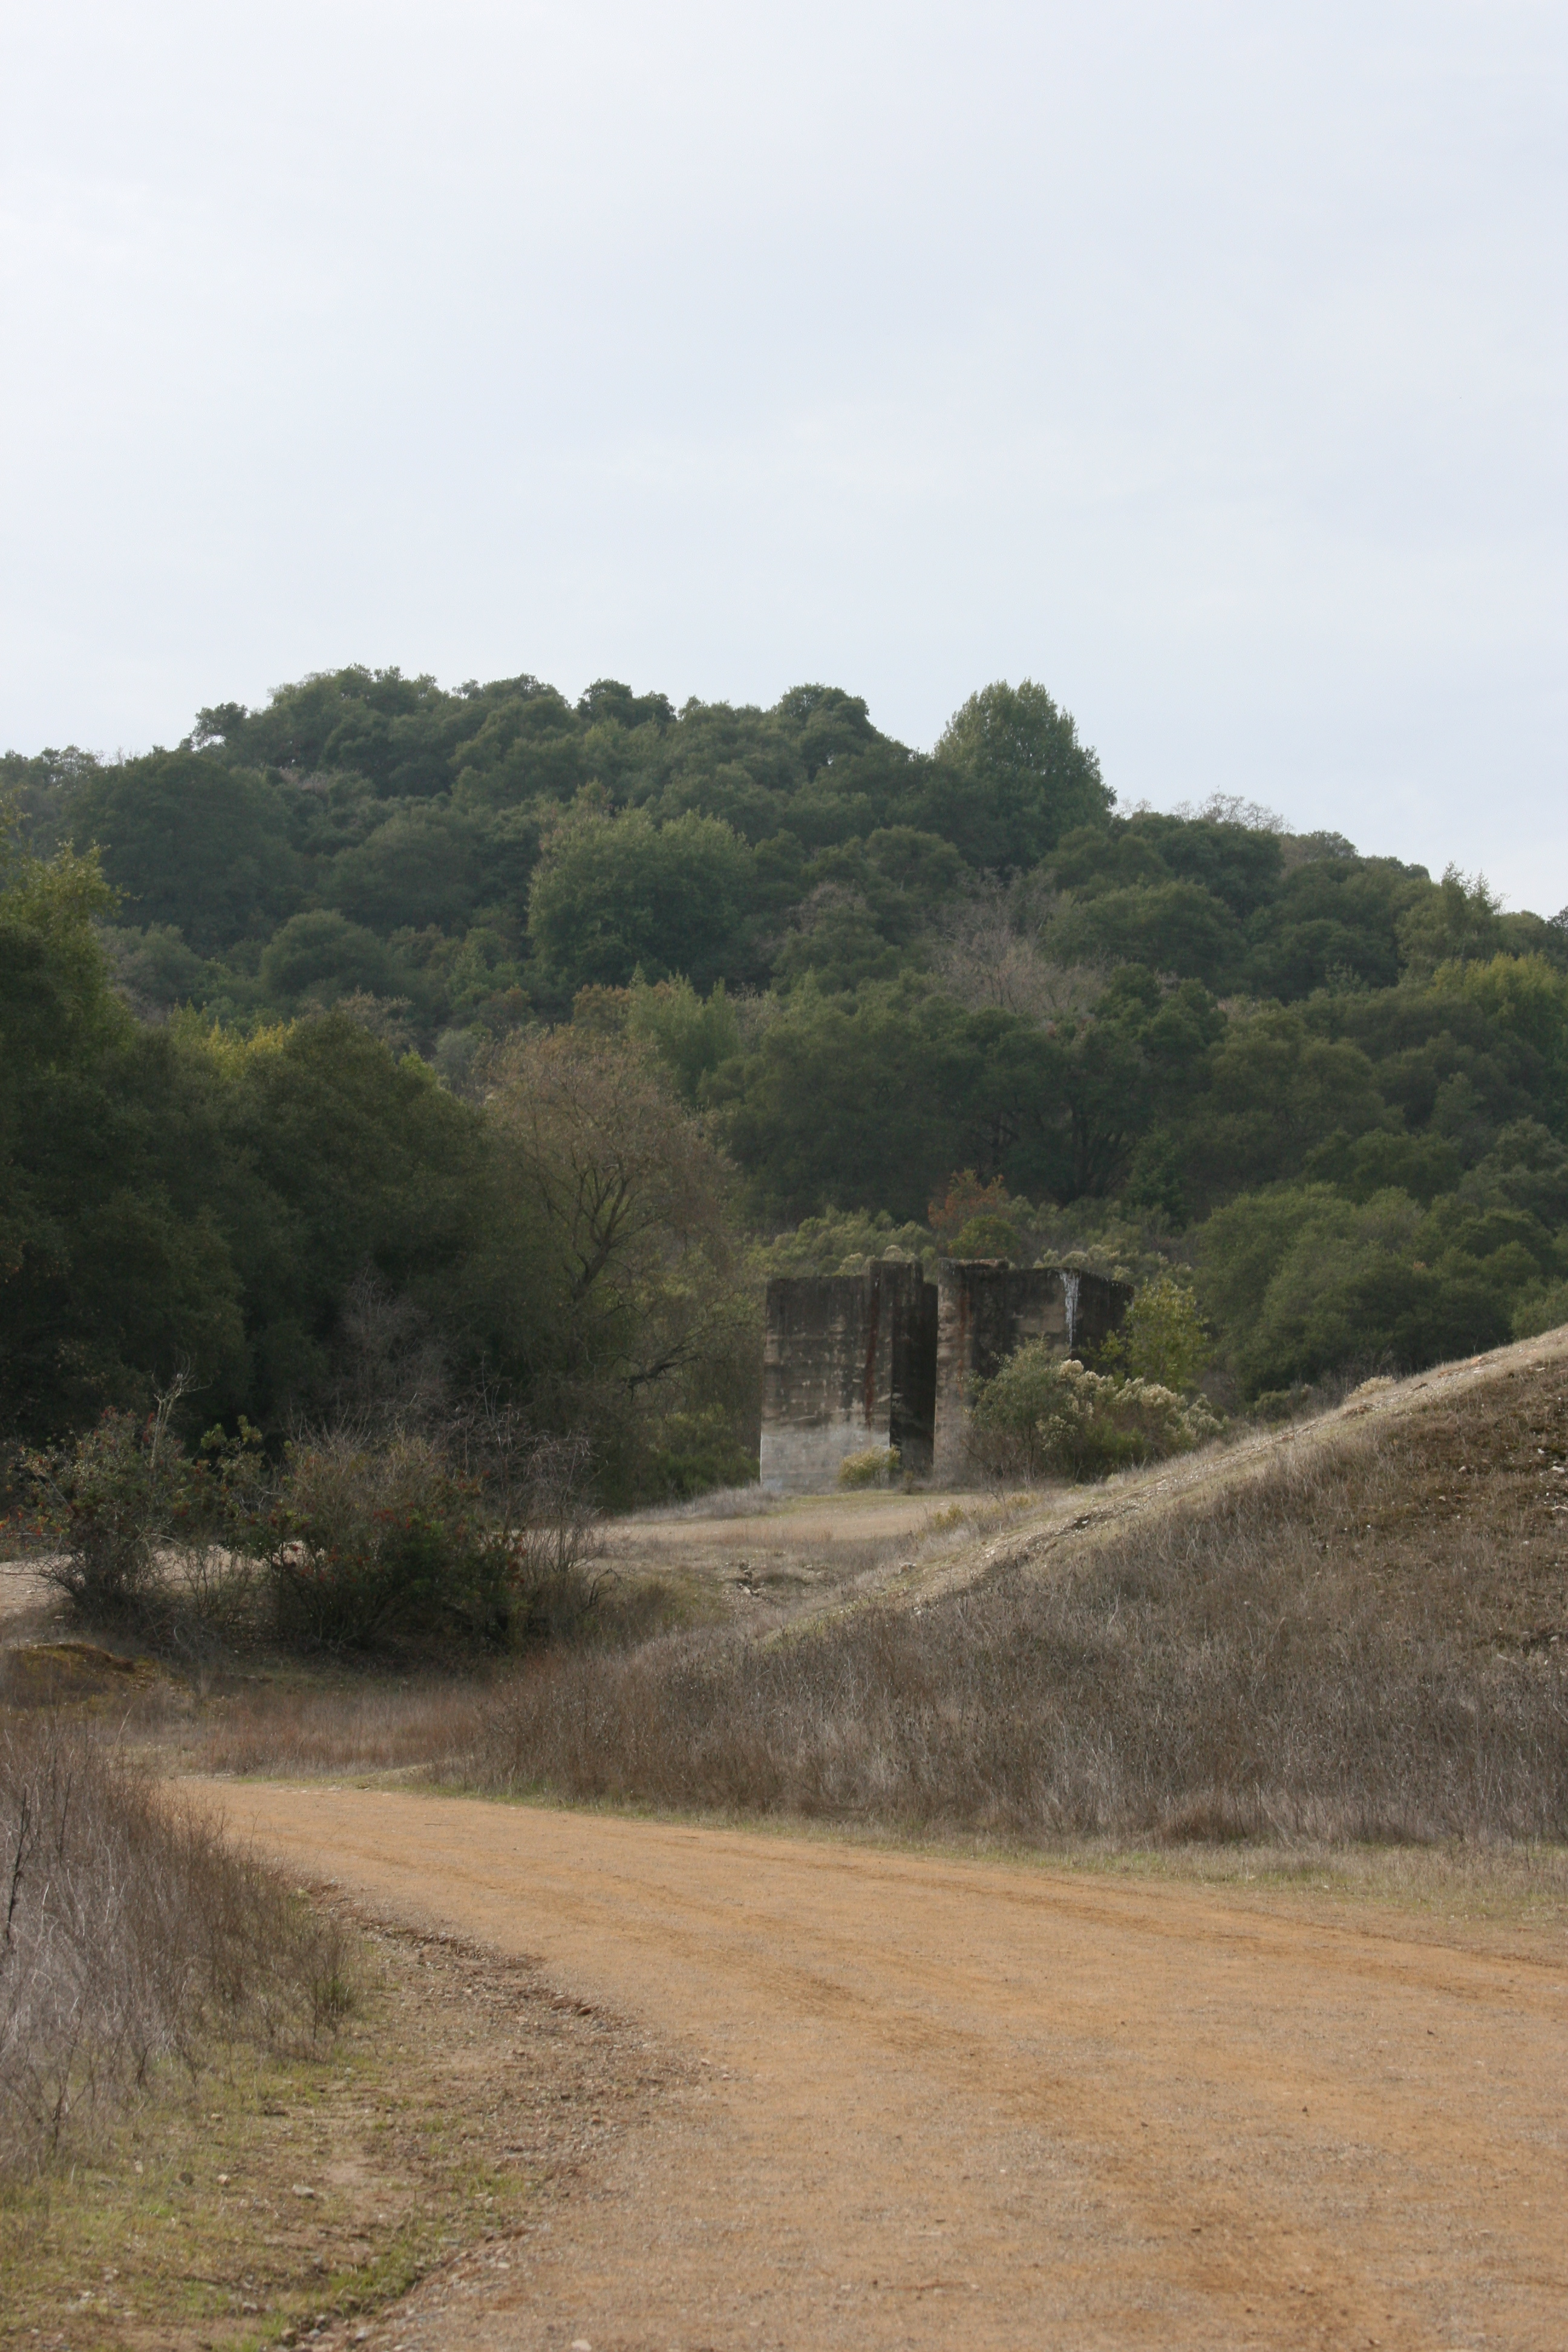 Almaden Quicksilver County Park - Wikipedia